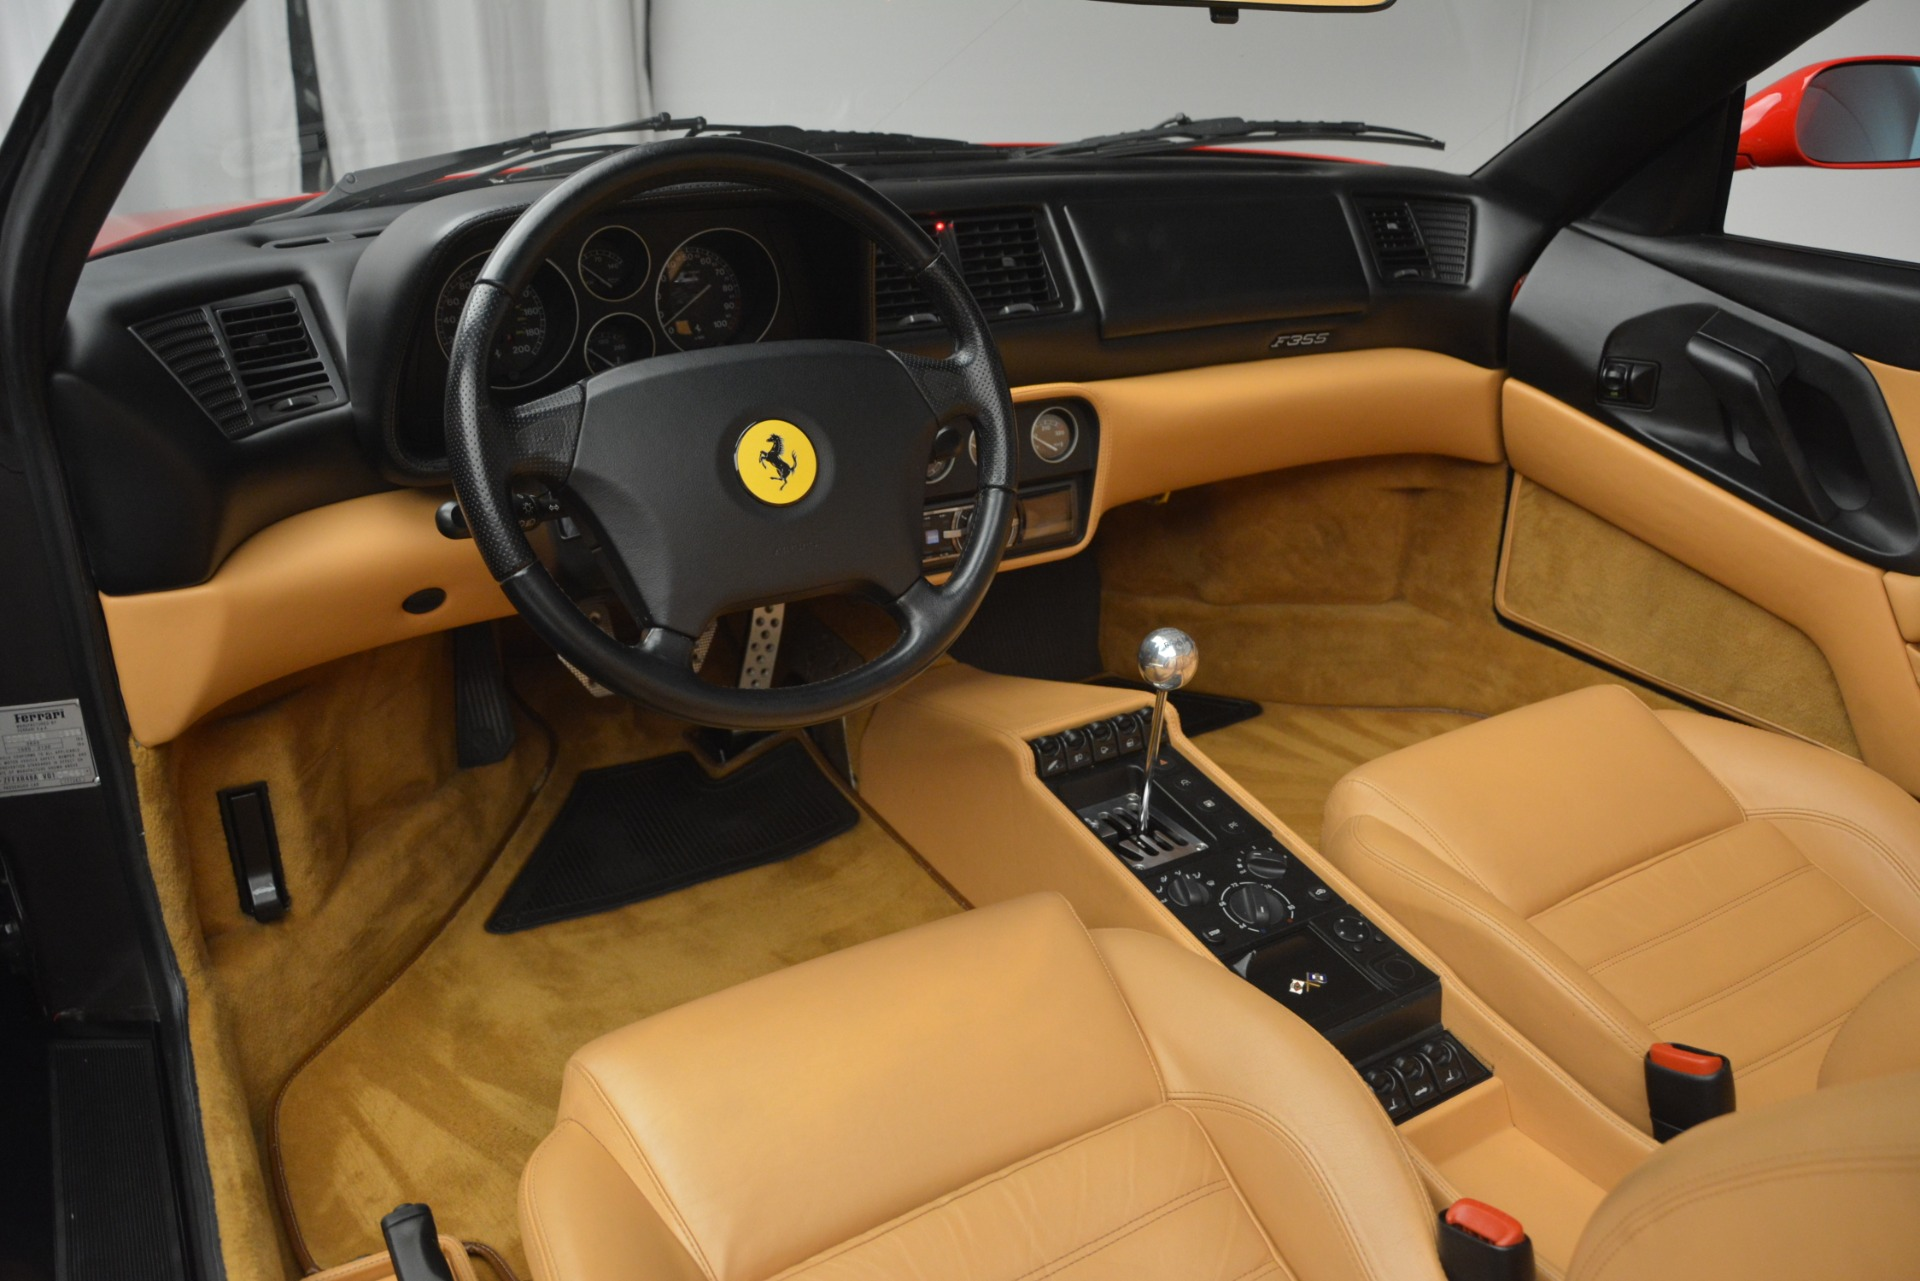 Used 1997 Ferrari 355 Spider 6-Speed Manual For Sale In Westport, CT 2735_p28